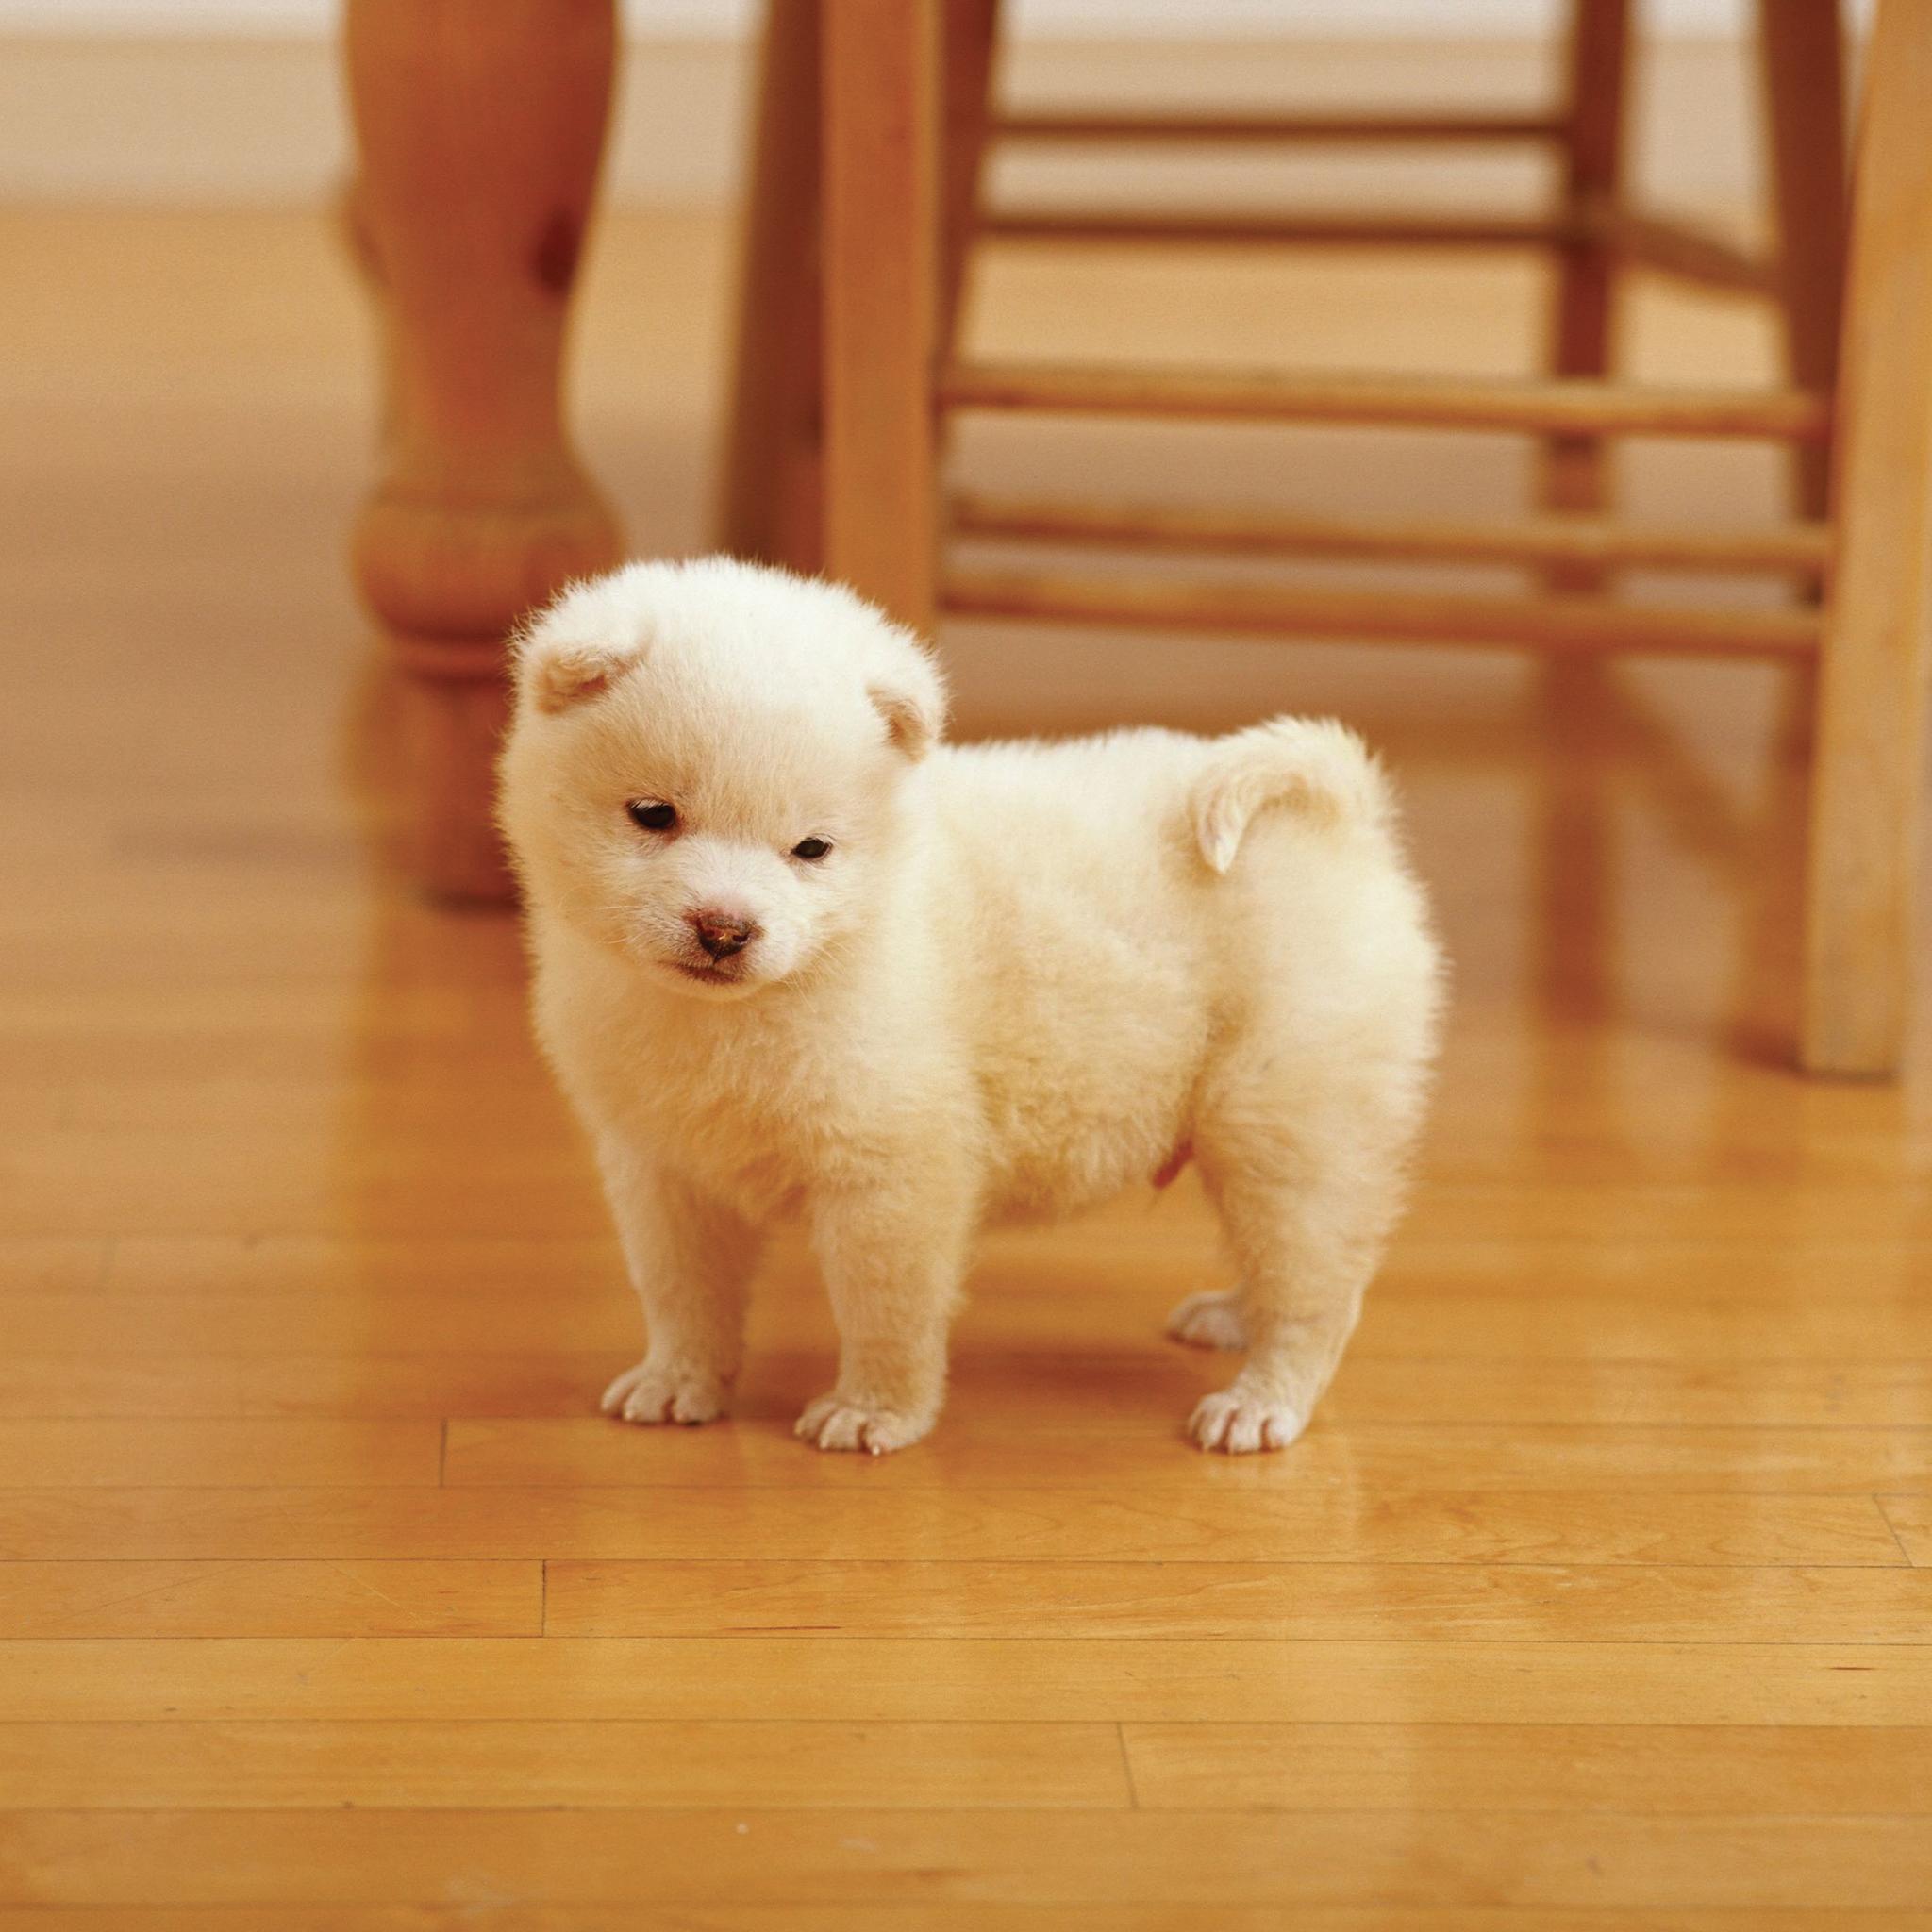 Dogs-Puppy-3Wallpapers-ipad-Retina